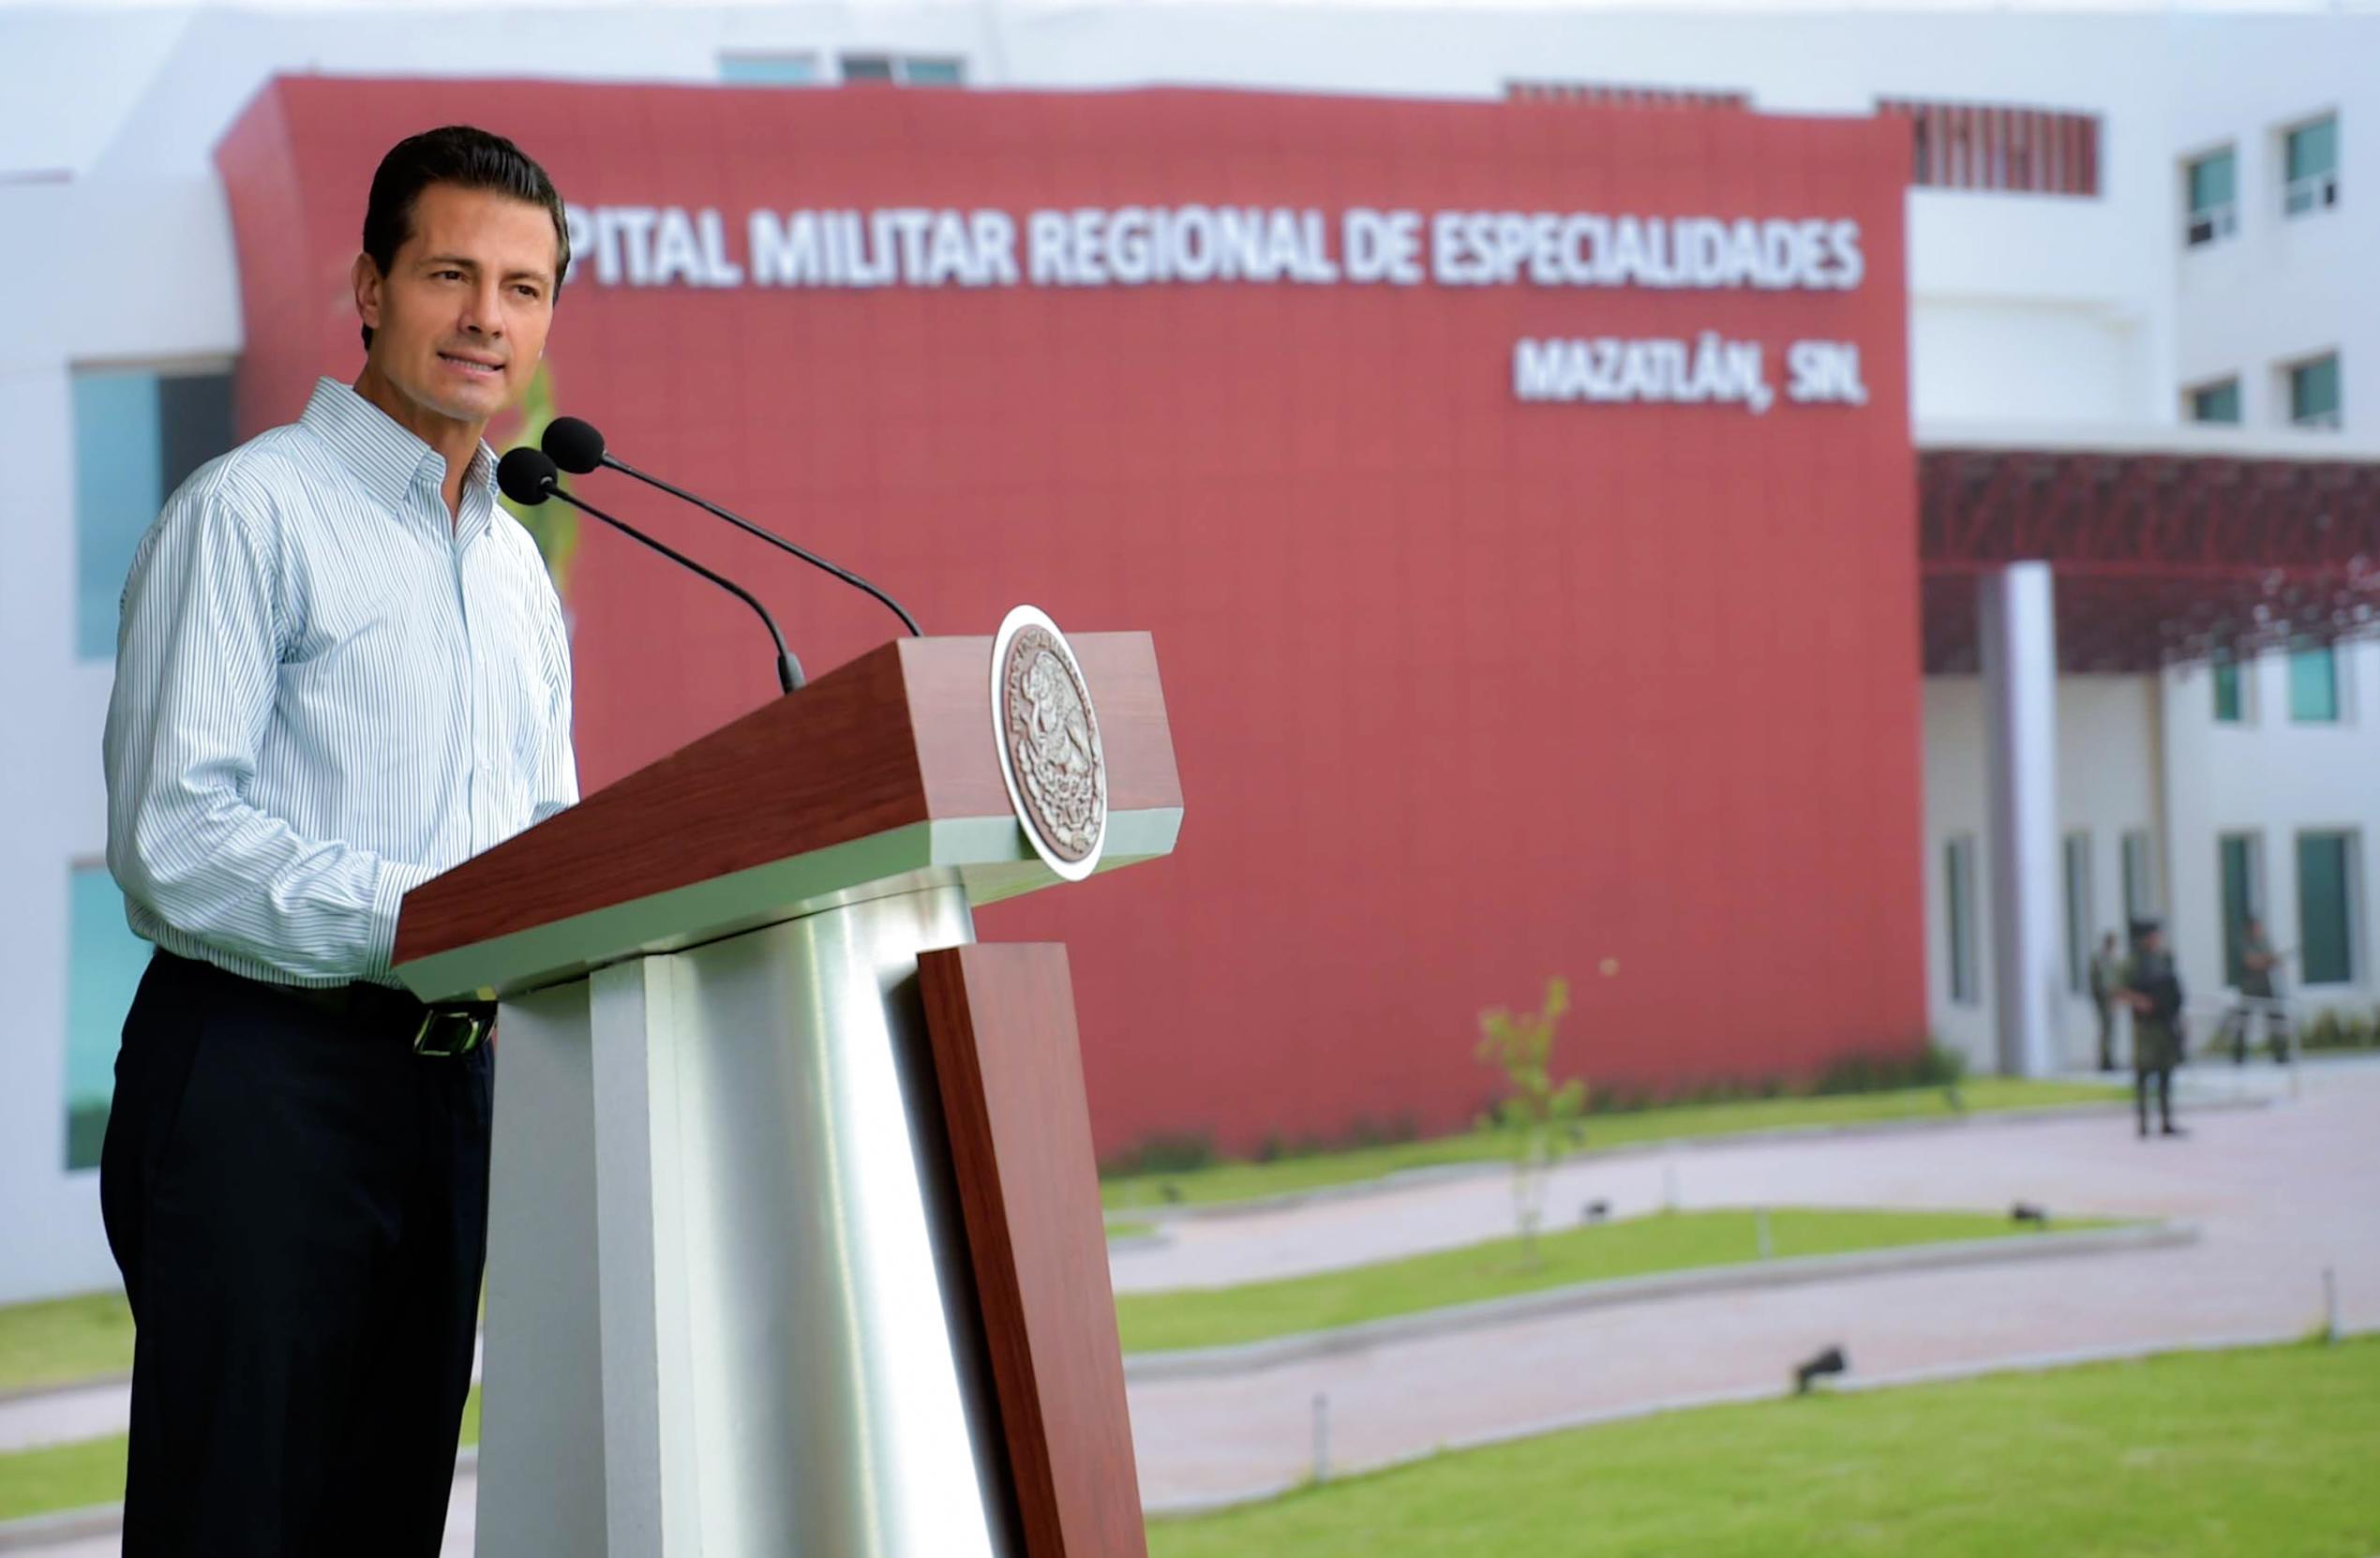 Hospital Militar Regional De Especialidades De Mazatl U00e1n